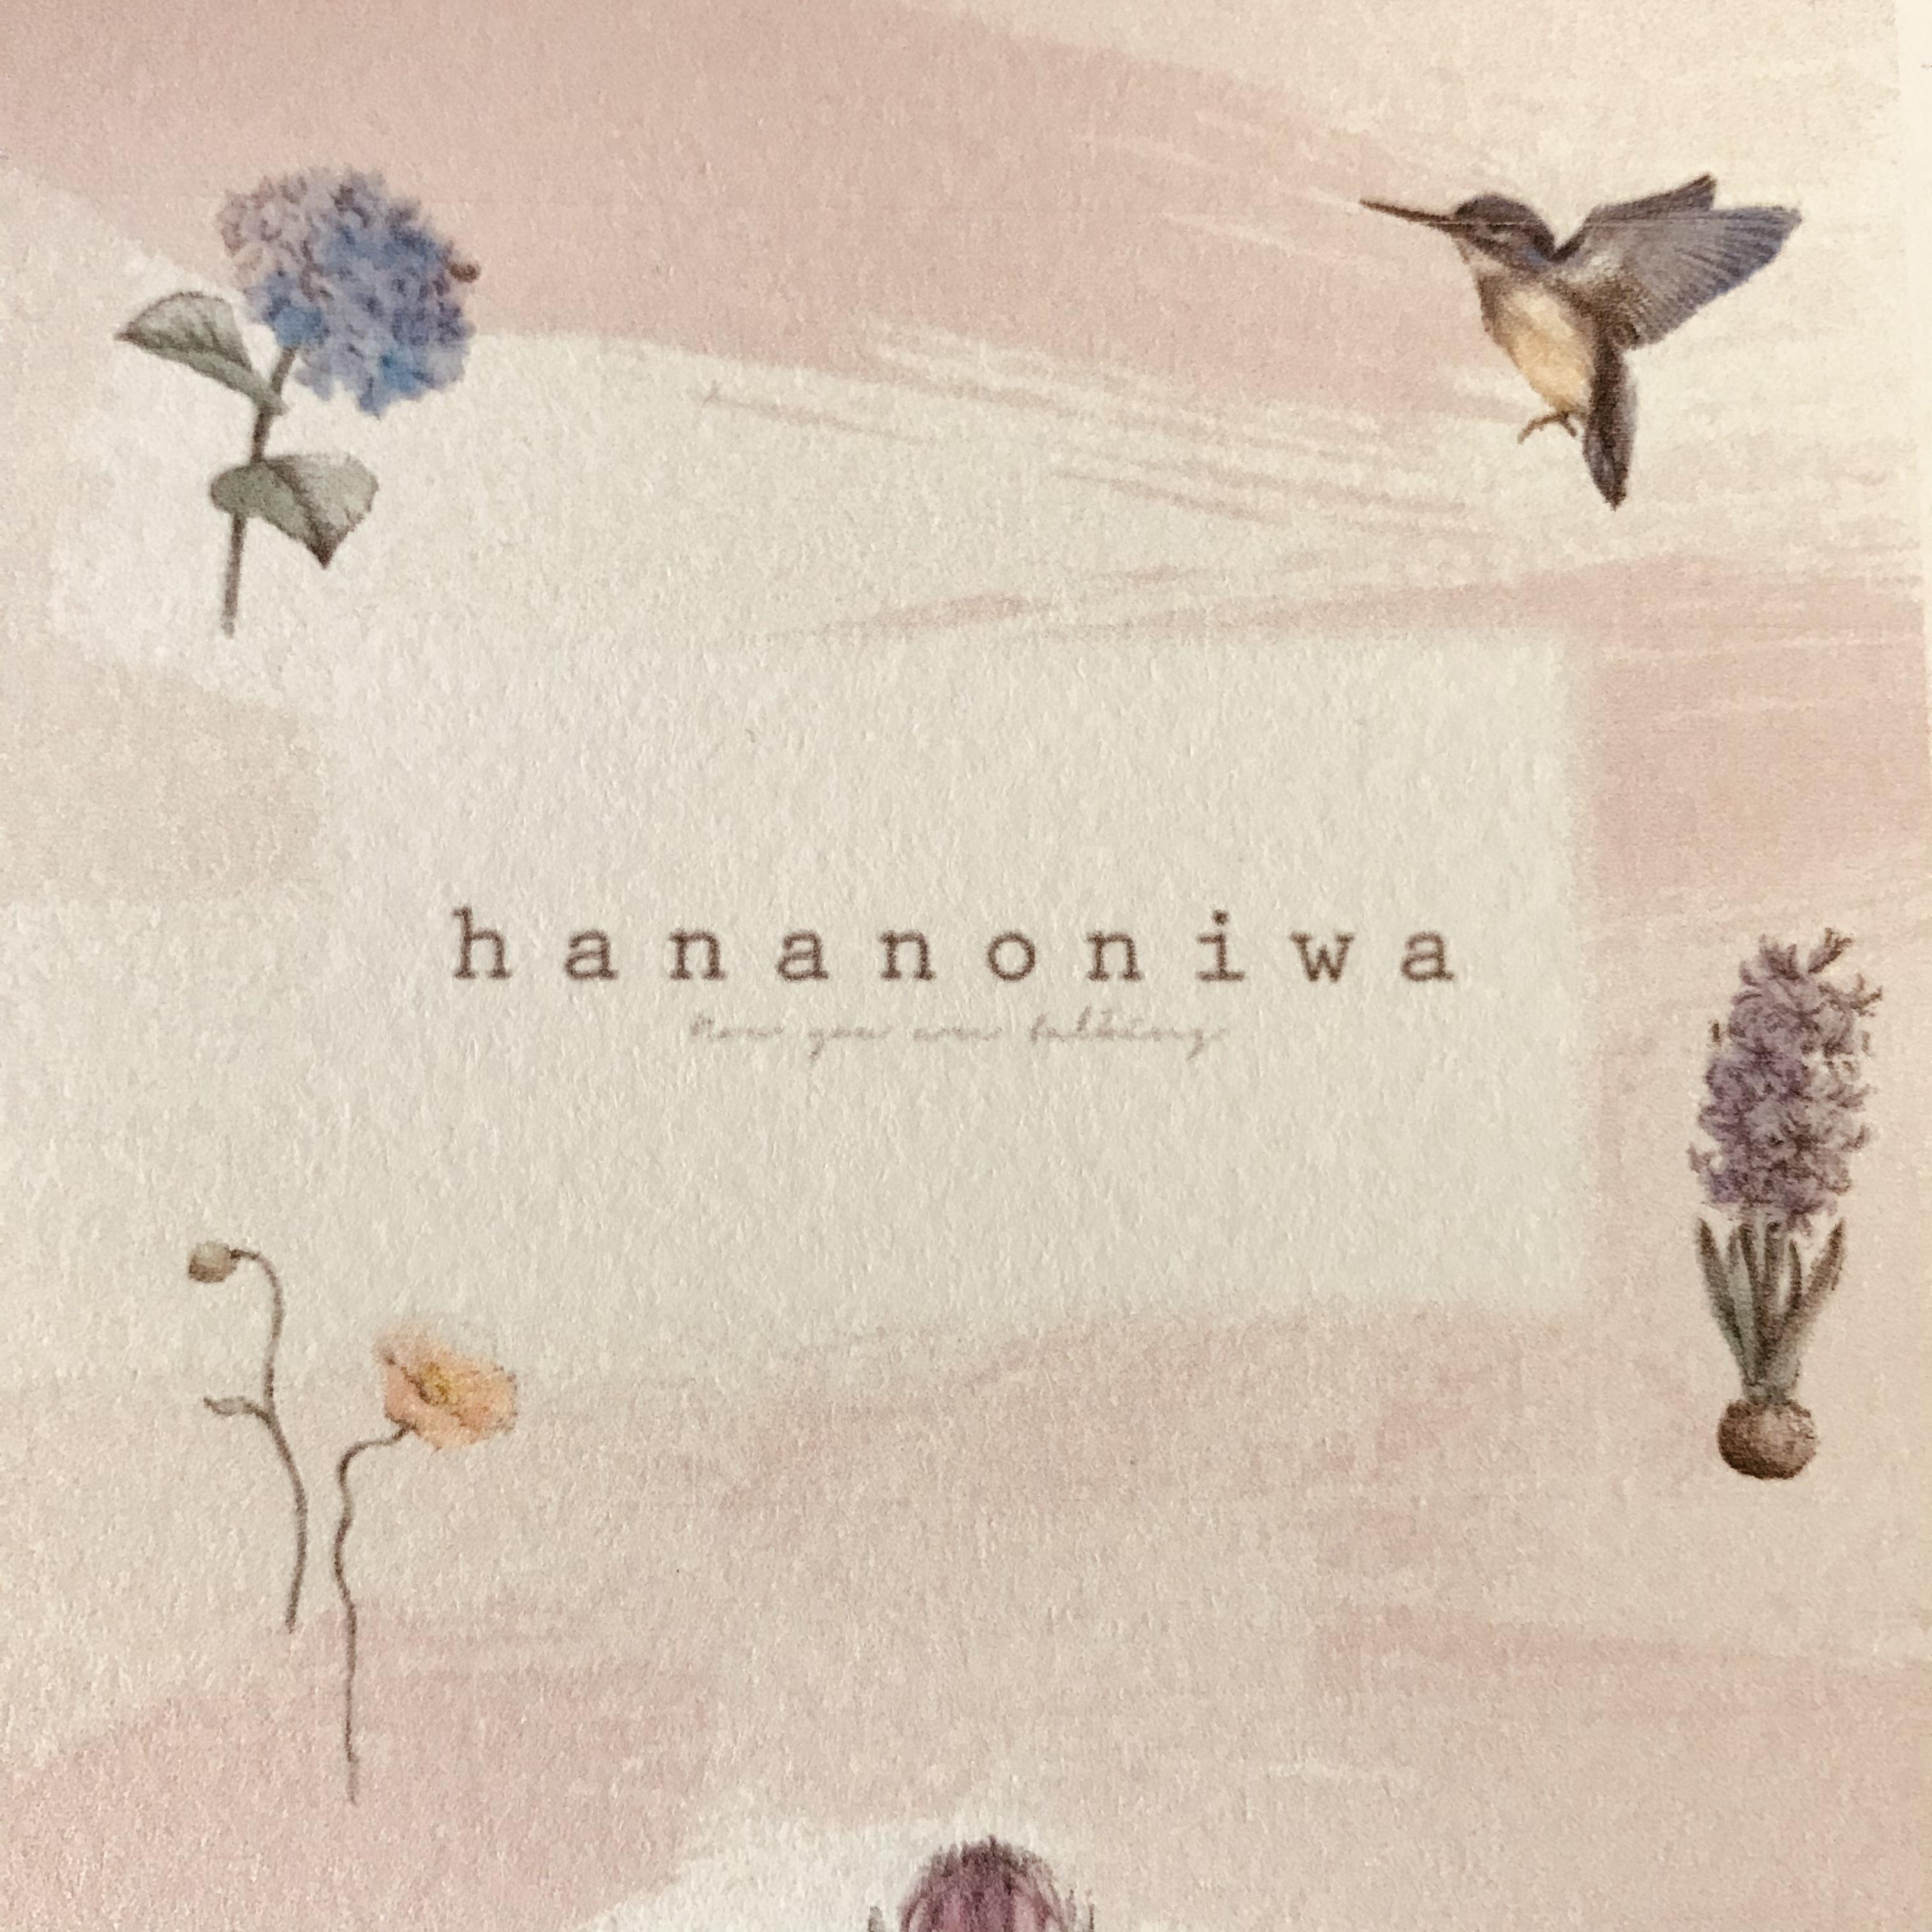 hananoniwa / 暮らしを楽しむ  花瓶・雑貨・美容・生活雑貨